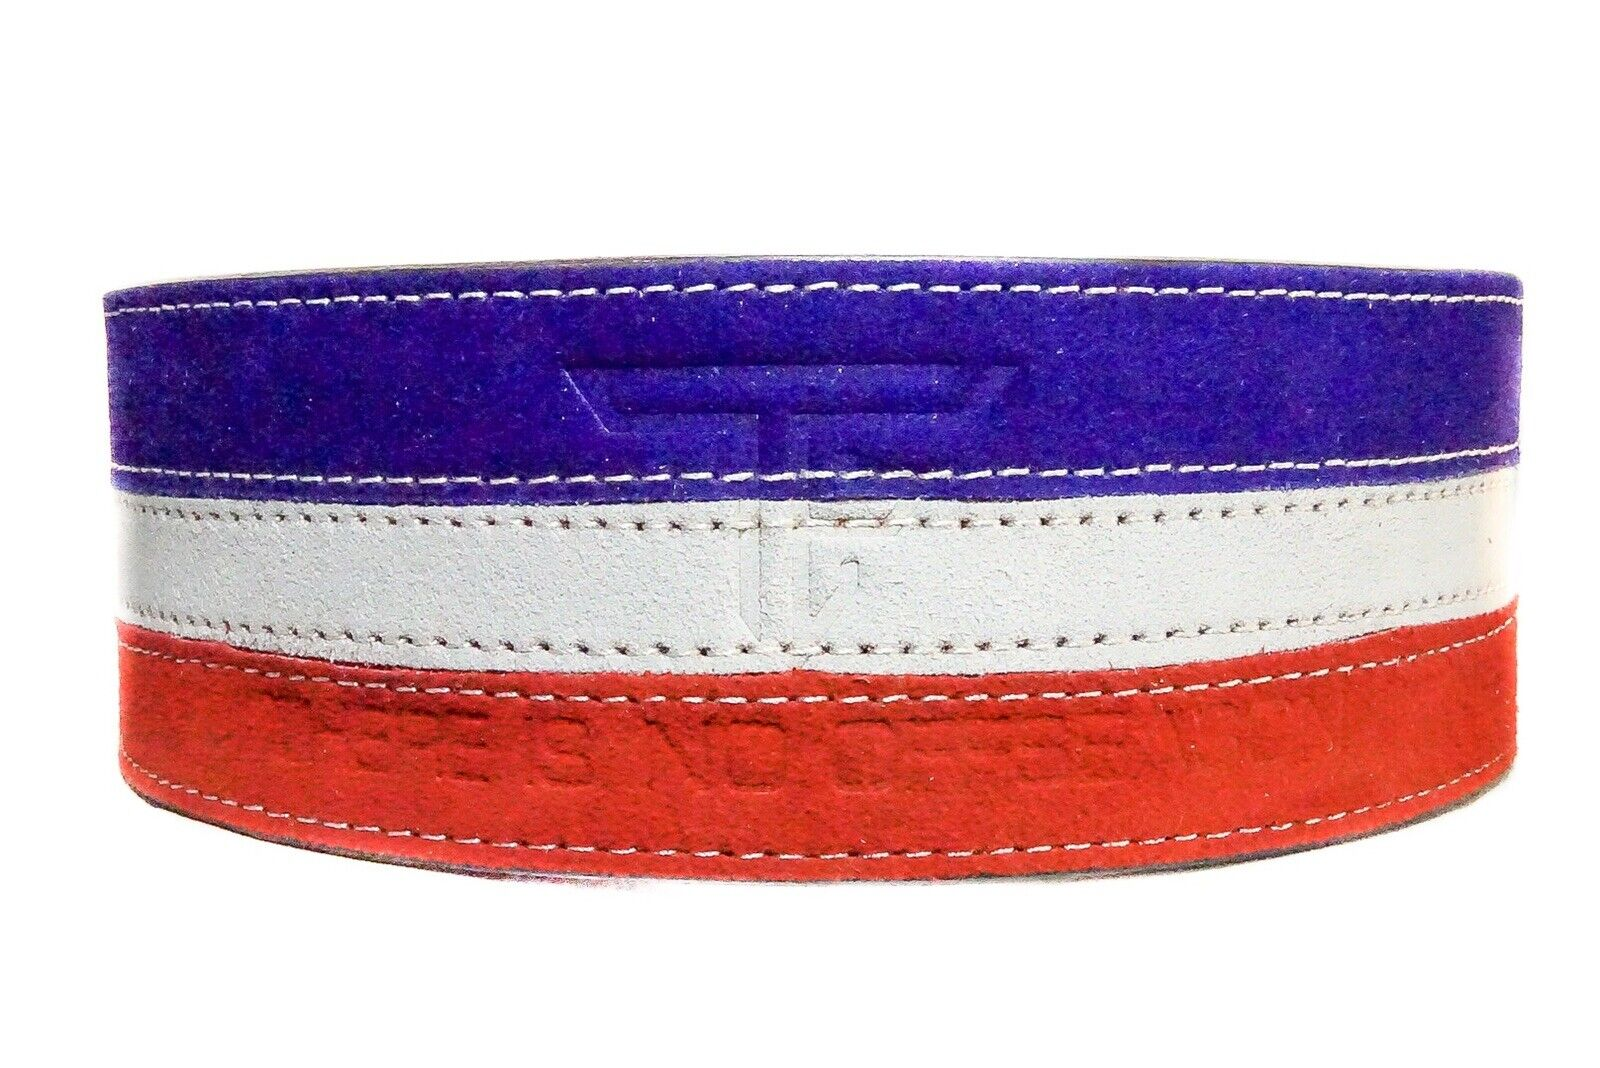 TF 10mm Lever Belt, rot Weiß Blau  (Rise gym Gear, Alphalete, Gymshark)